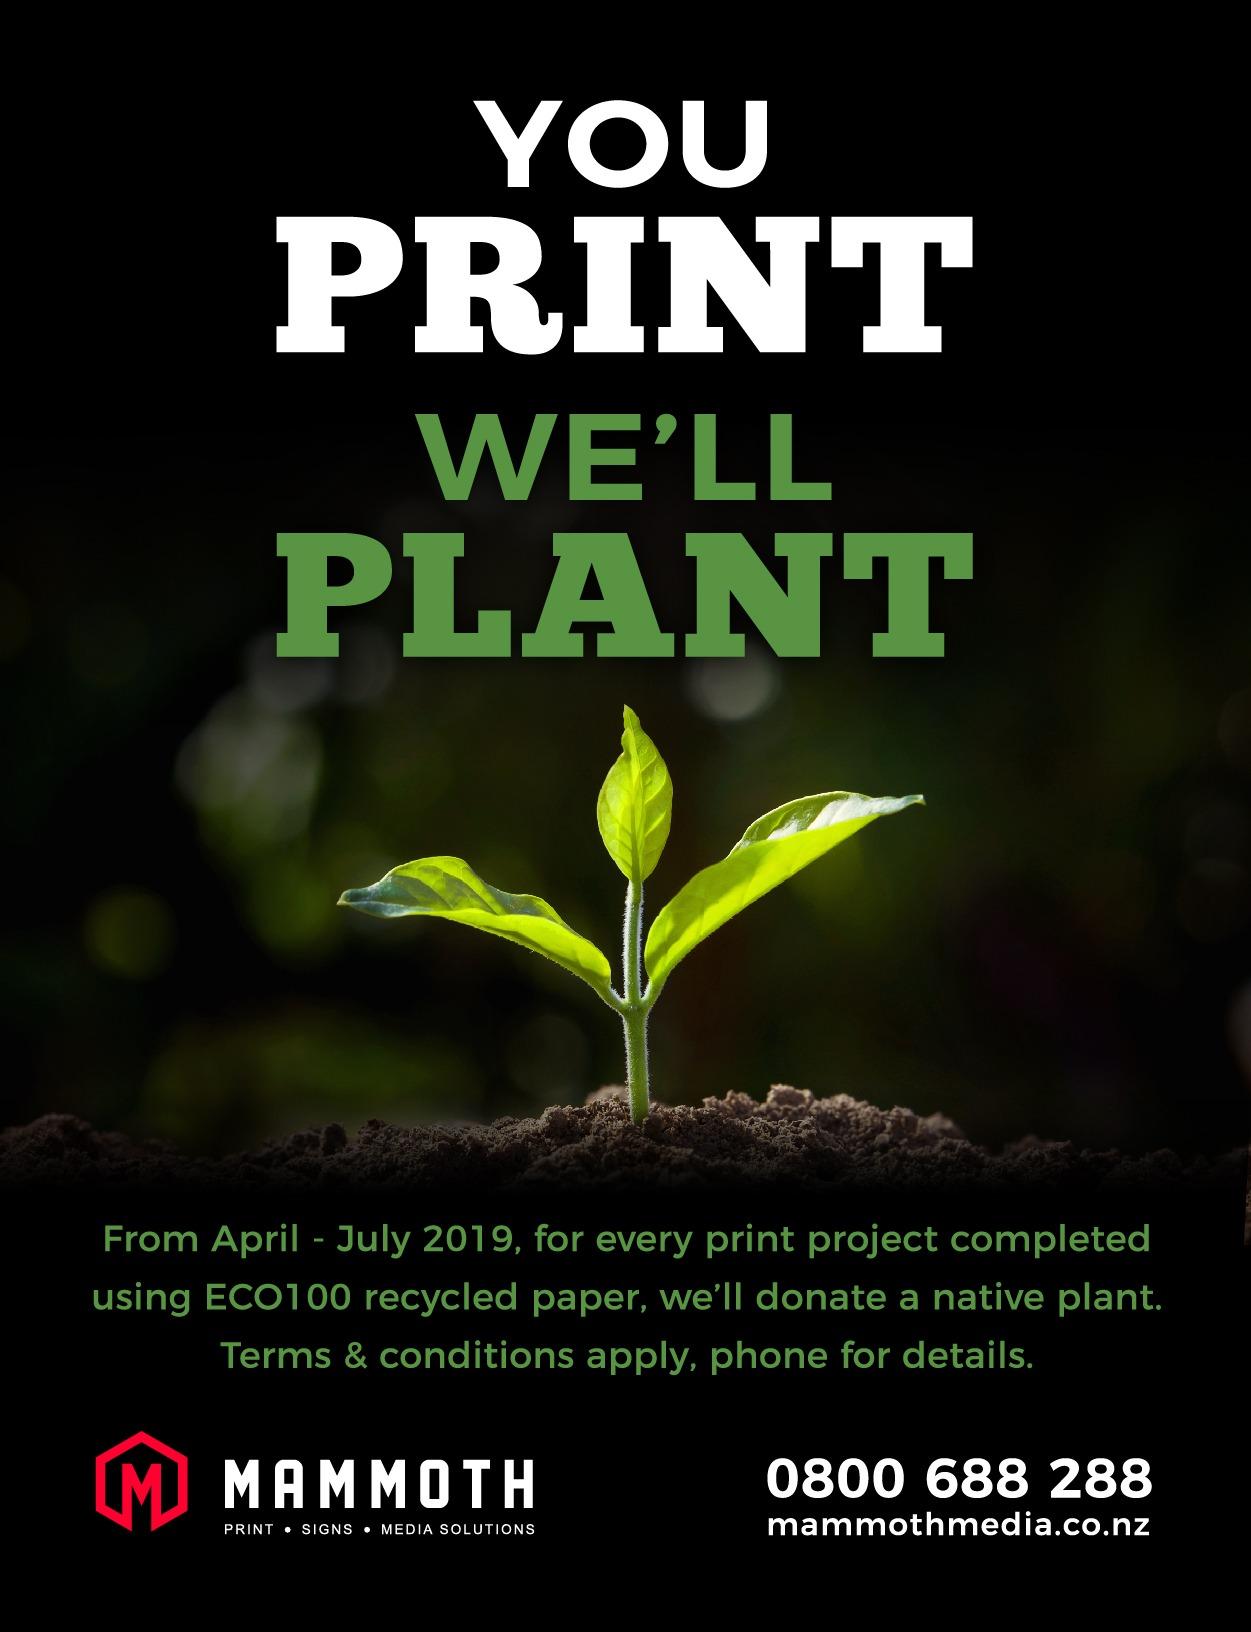 Mammoth - You Print We'll Plant